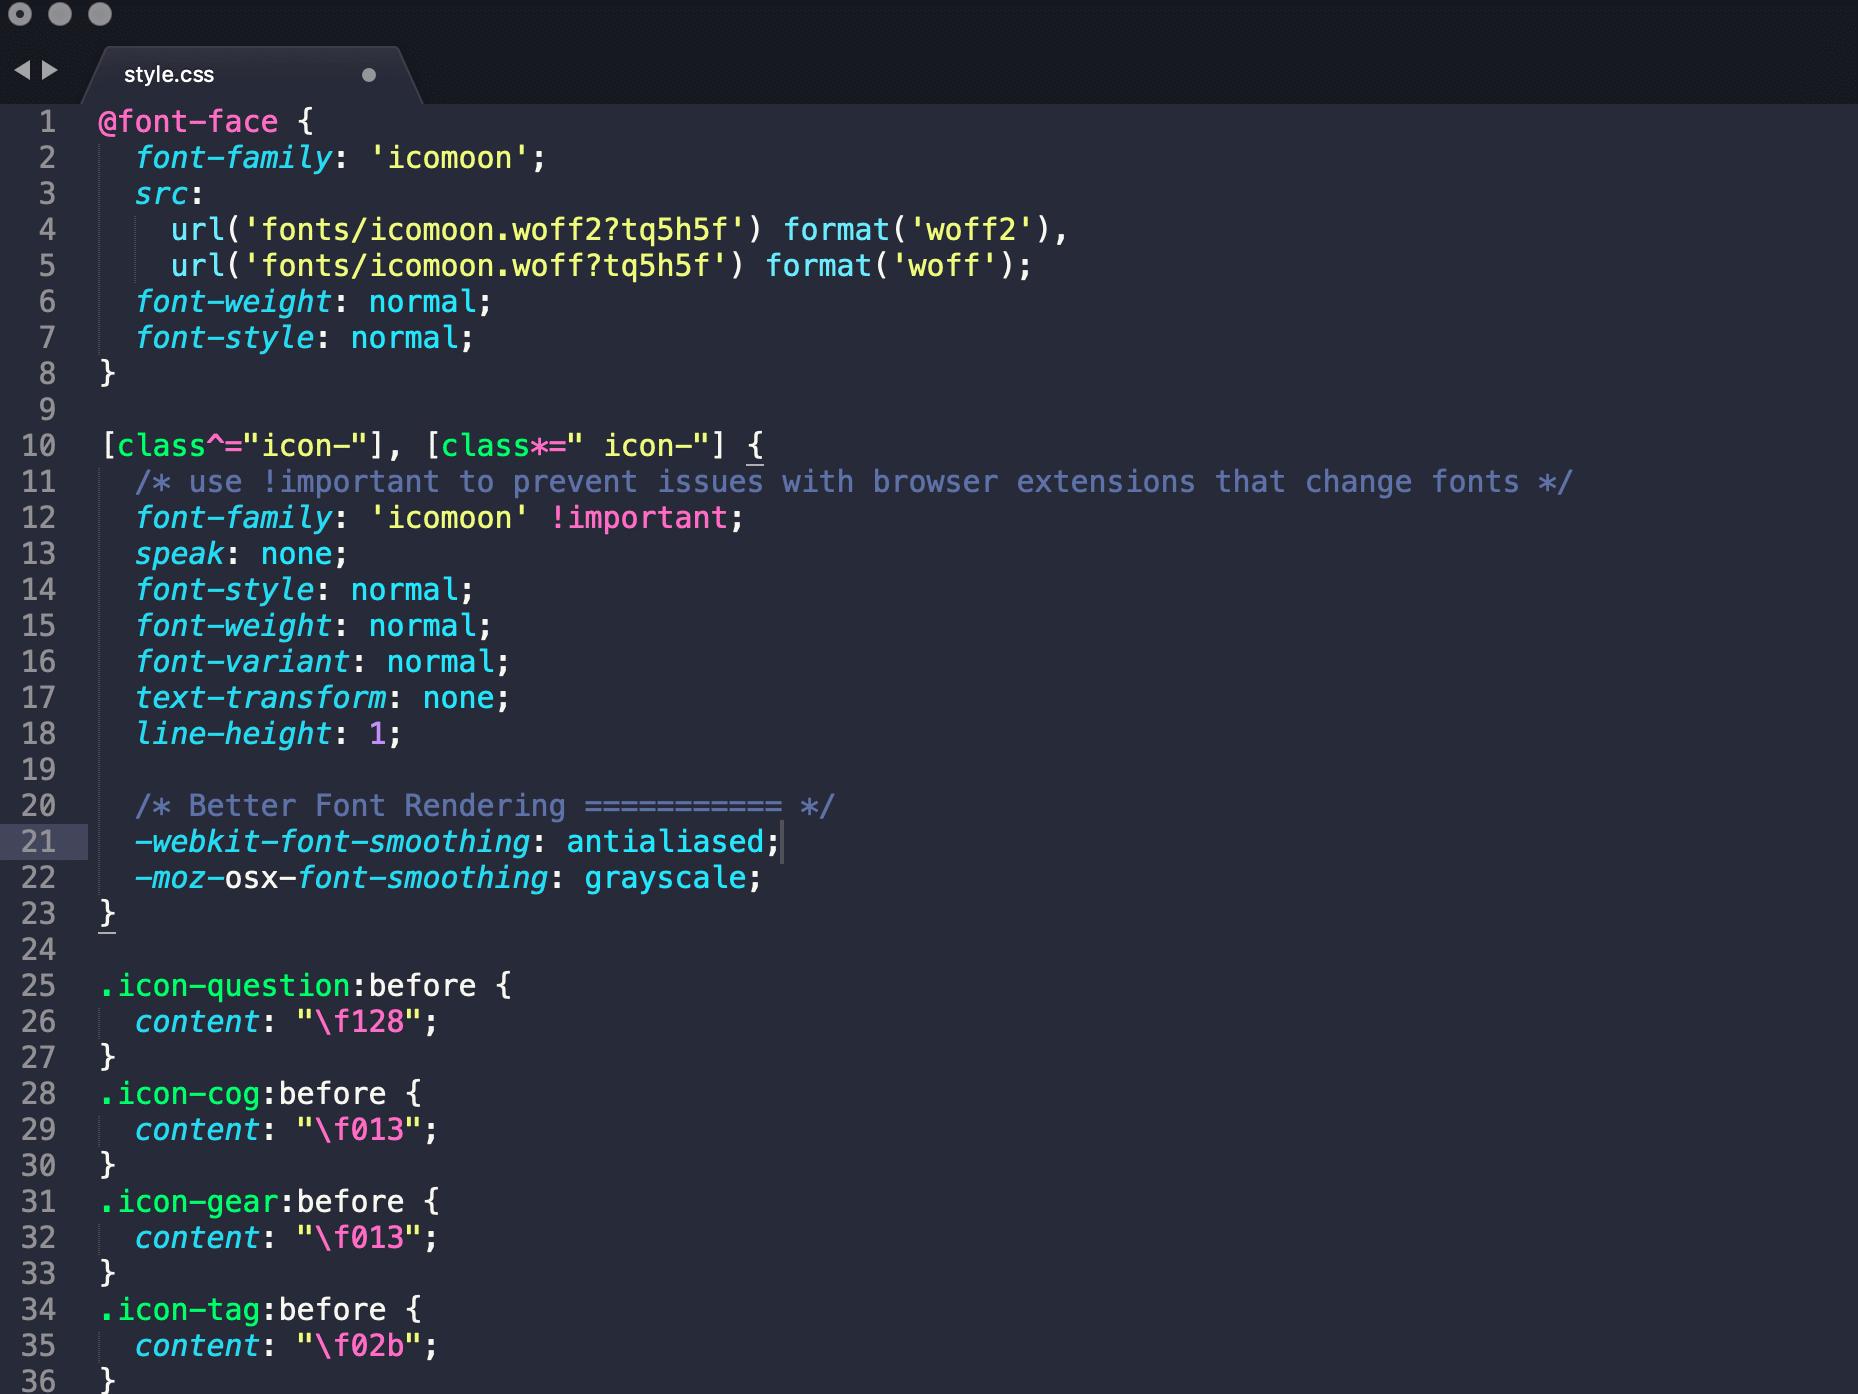 IcoMoon CSS file